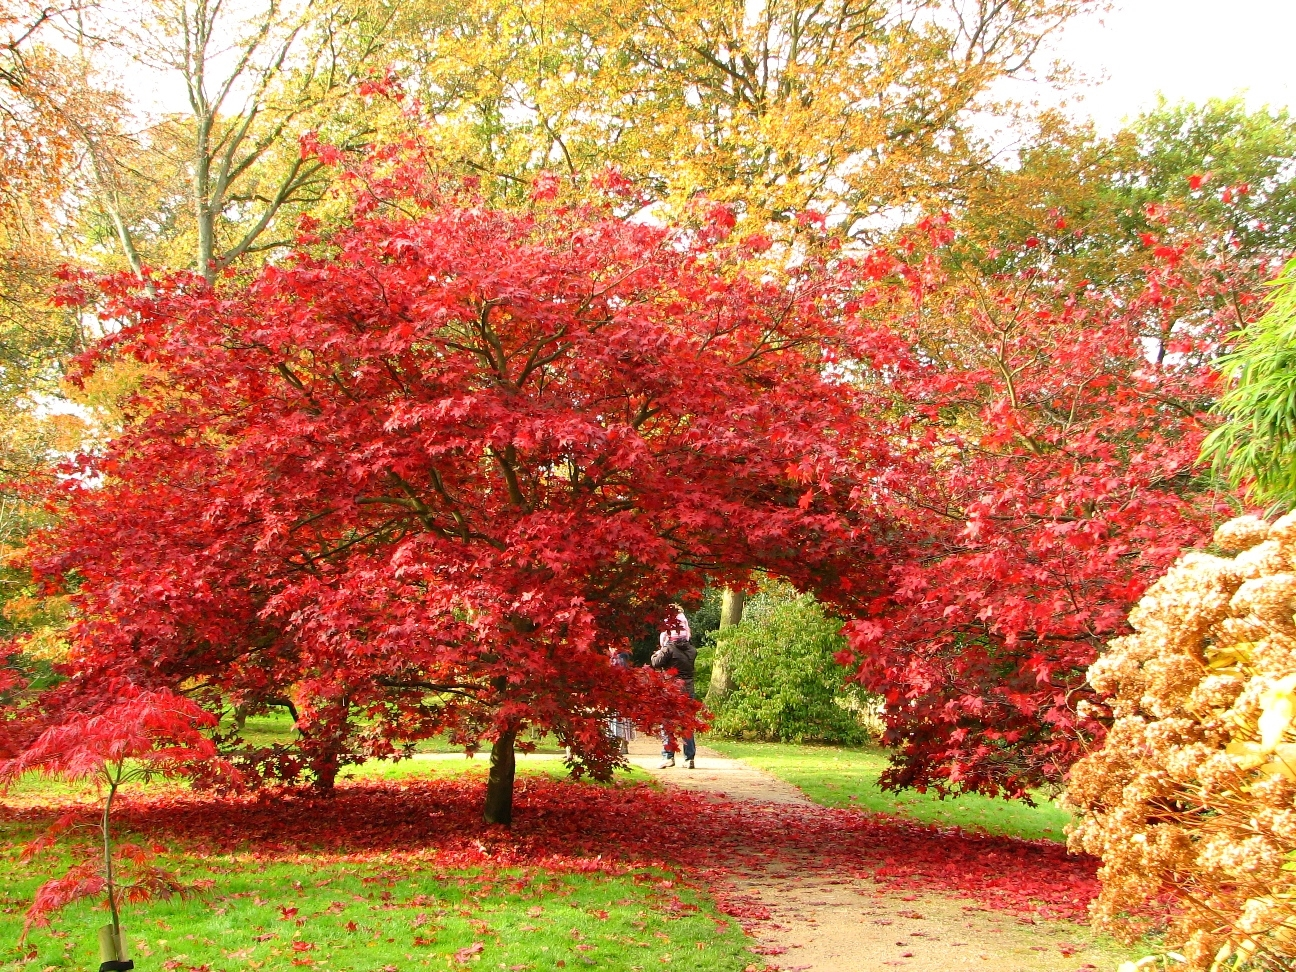 dunham massey altrincham cheshire wa14 4sj u2013 national garden scheme